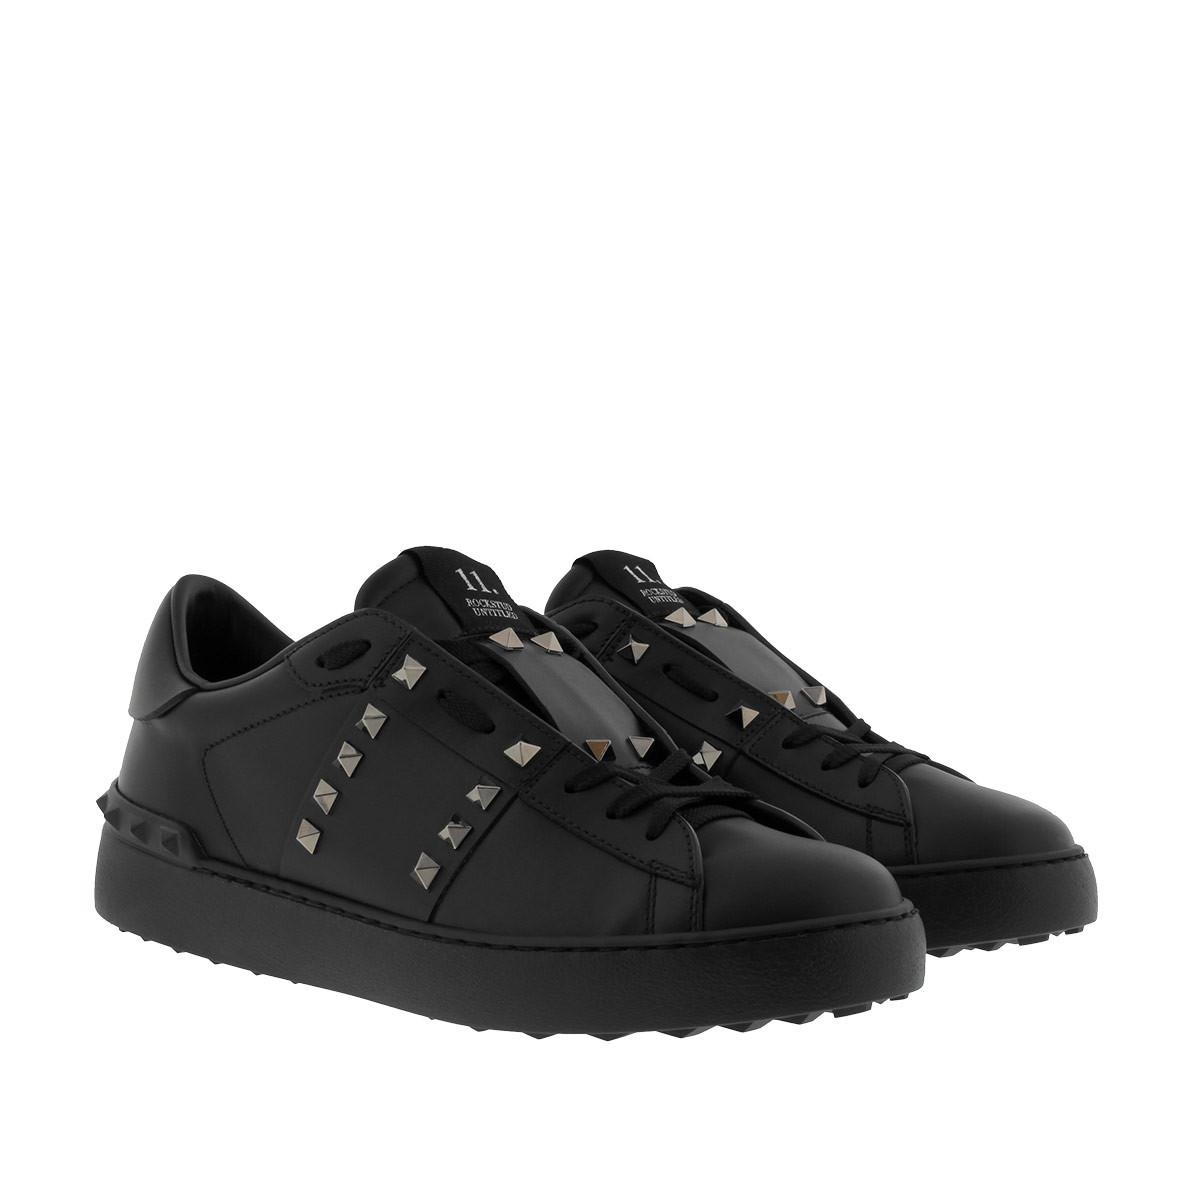 Valentino Sneakers - Rockstud Sneaker 0NO/Nero - in schwarz - für Damen